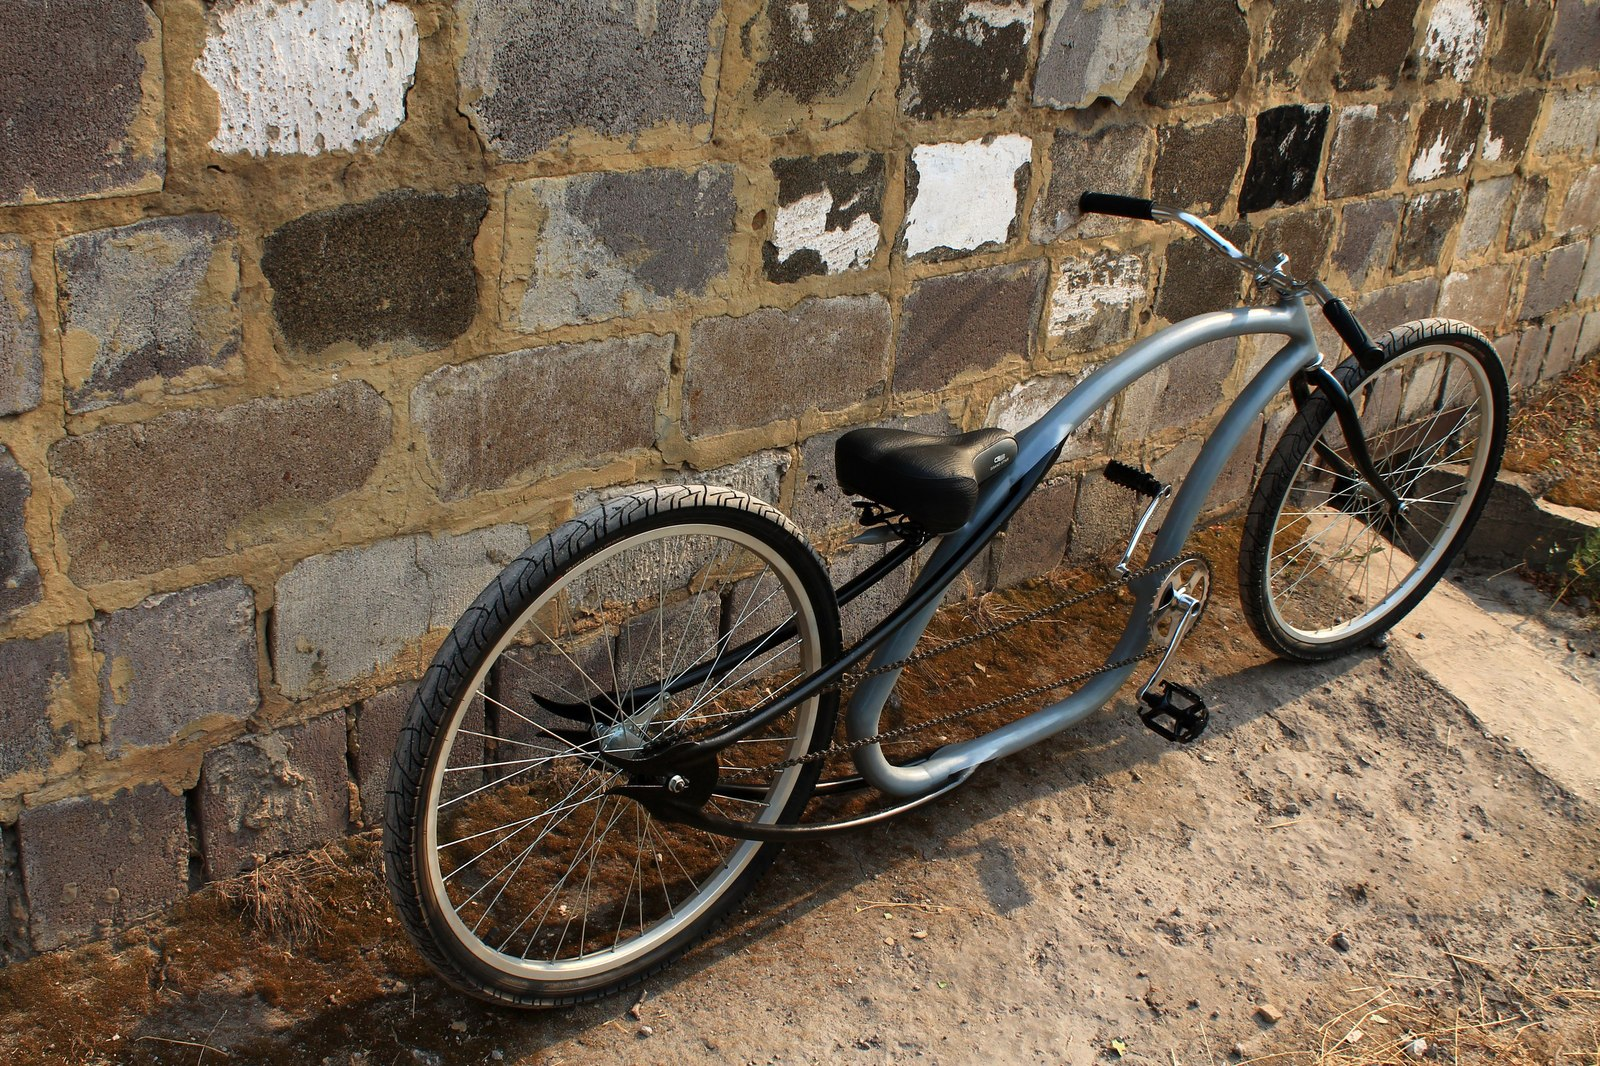 Велосипед лежачий своими руками фото 384